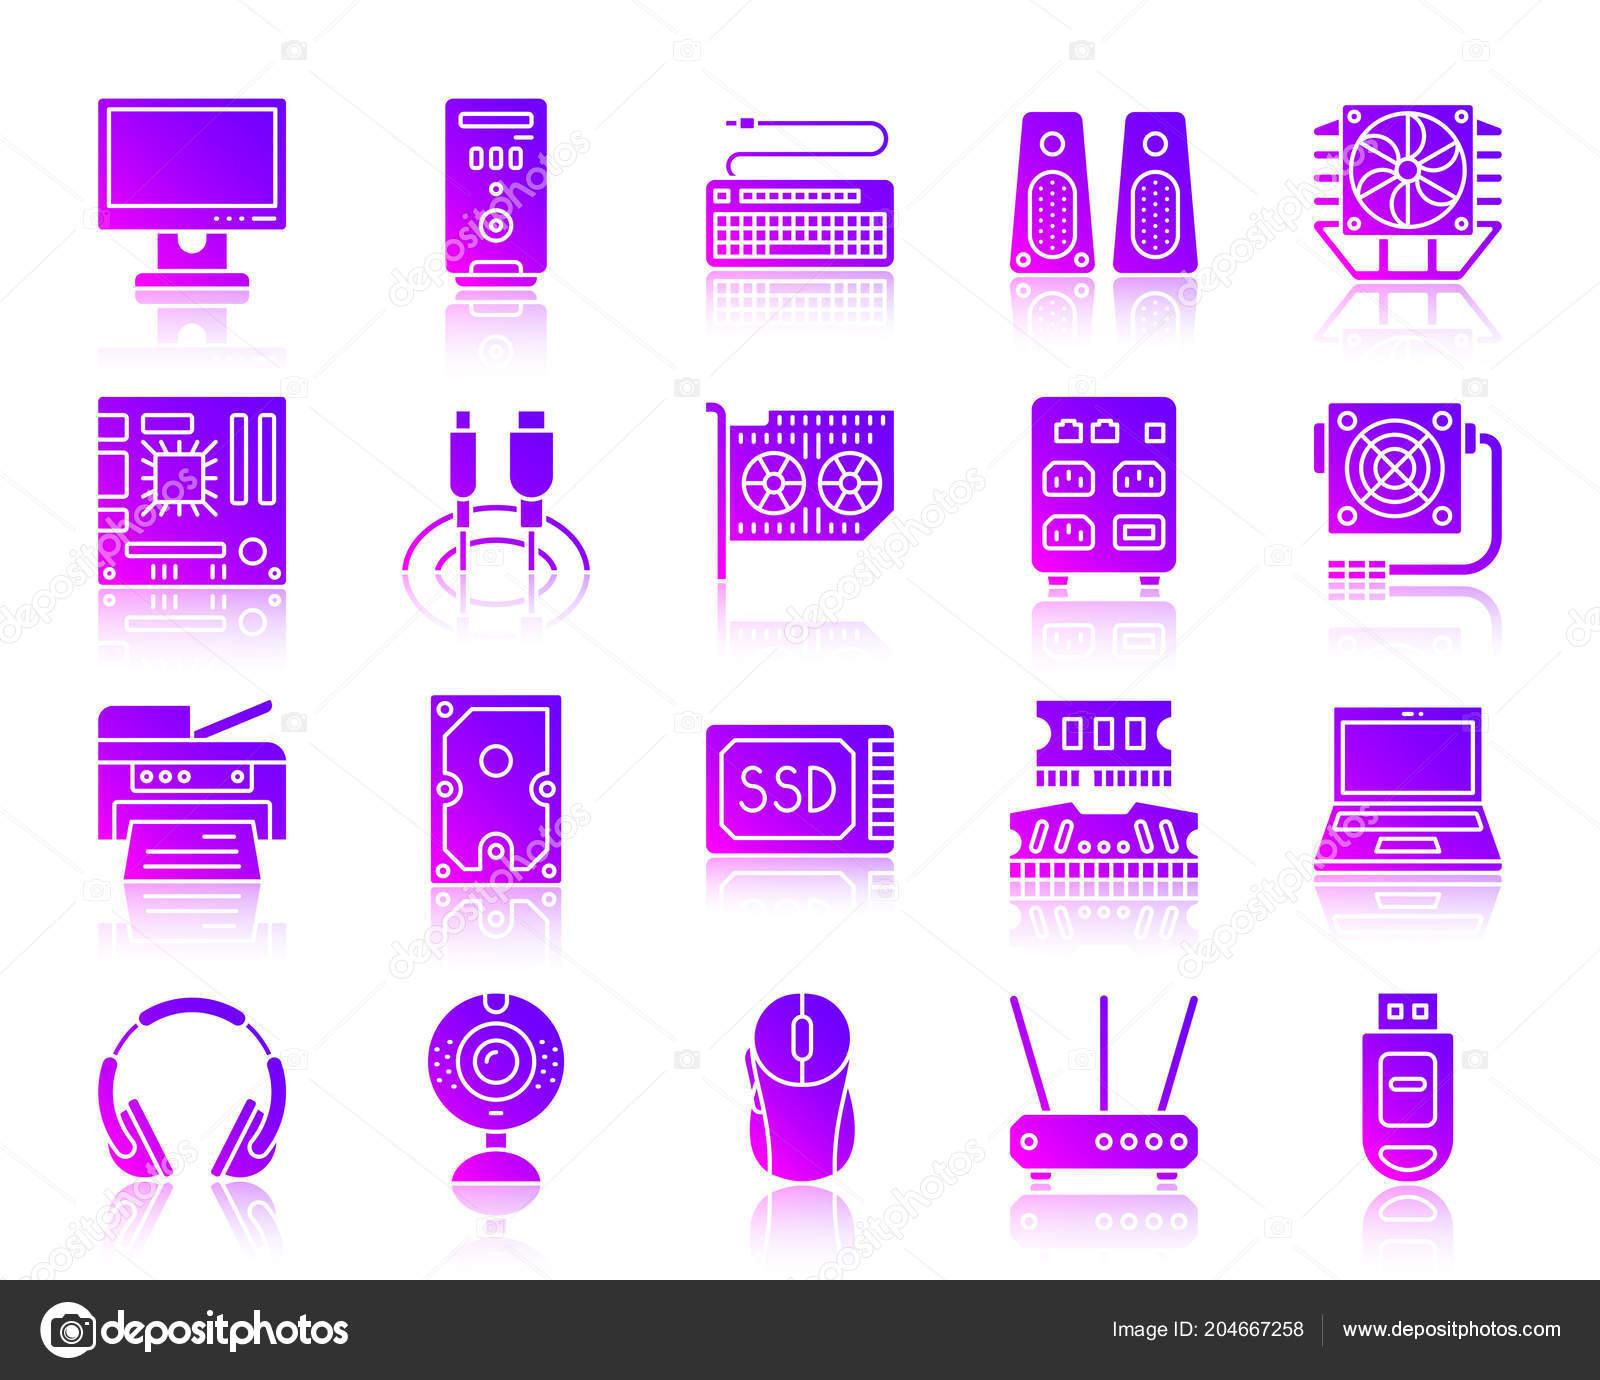 Download ultraviolet to computer